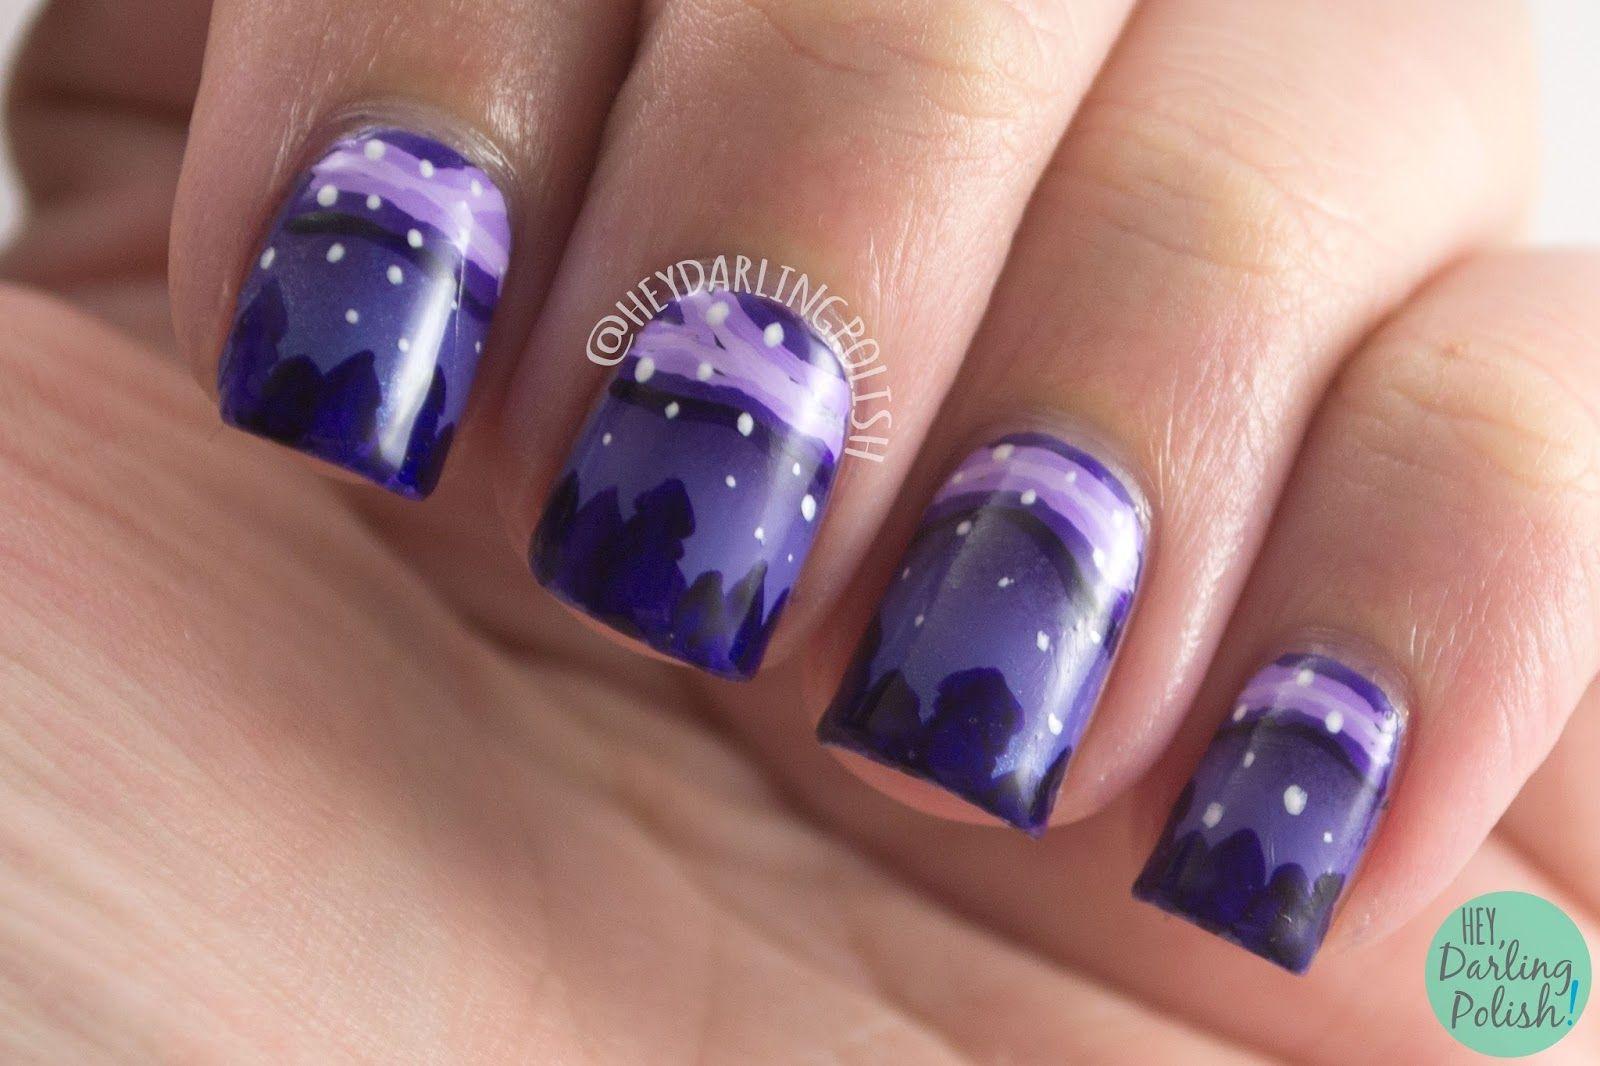 Nails Nail Art Nail Polish Purple Outdoors Trees Night Sky